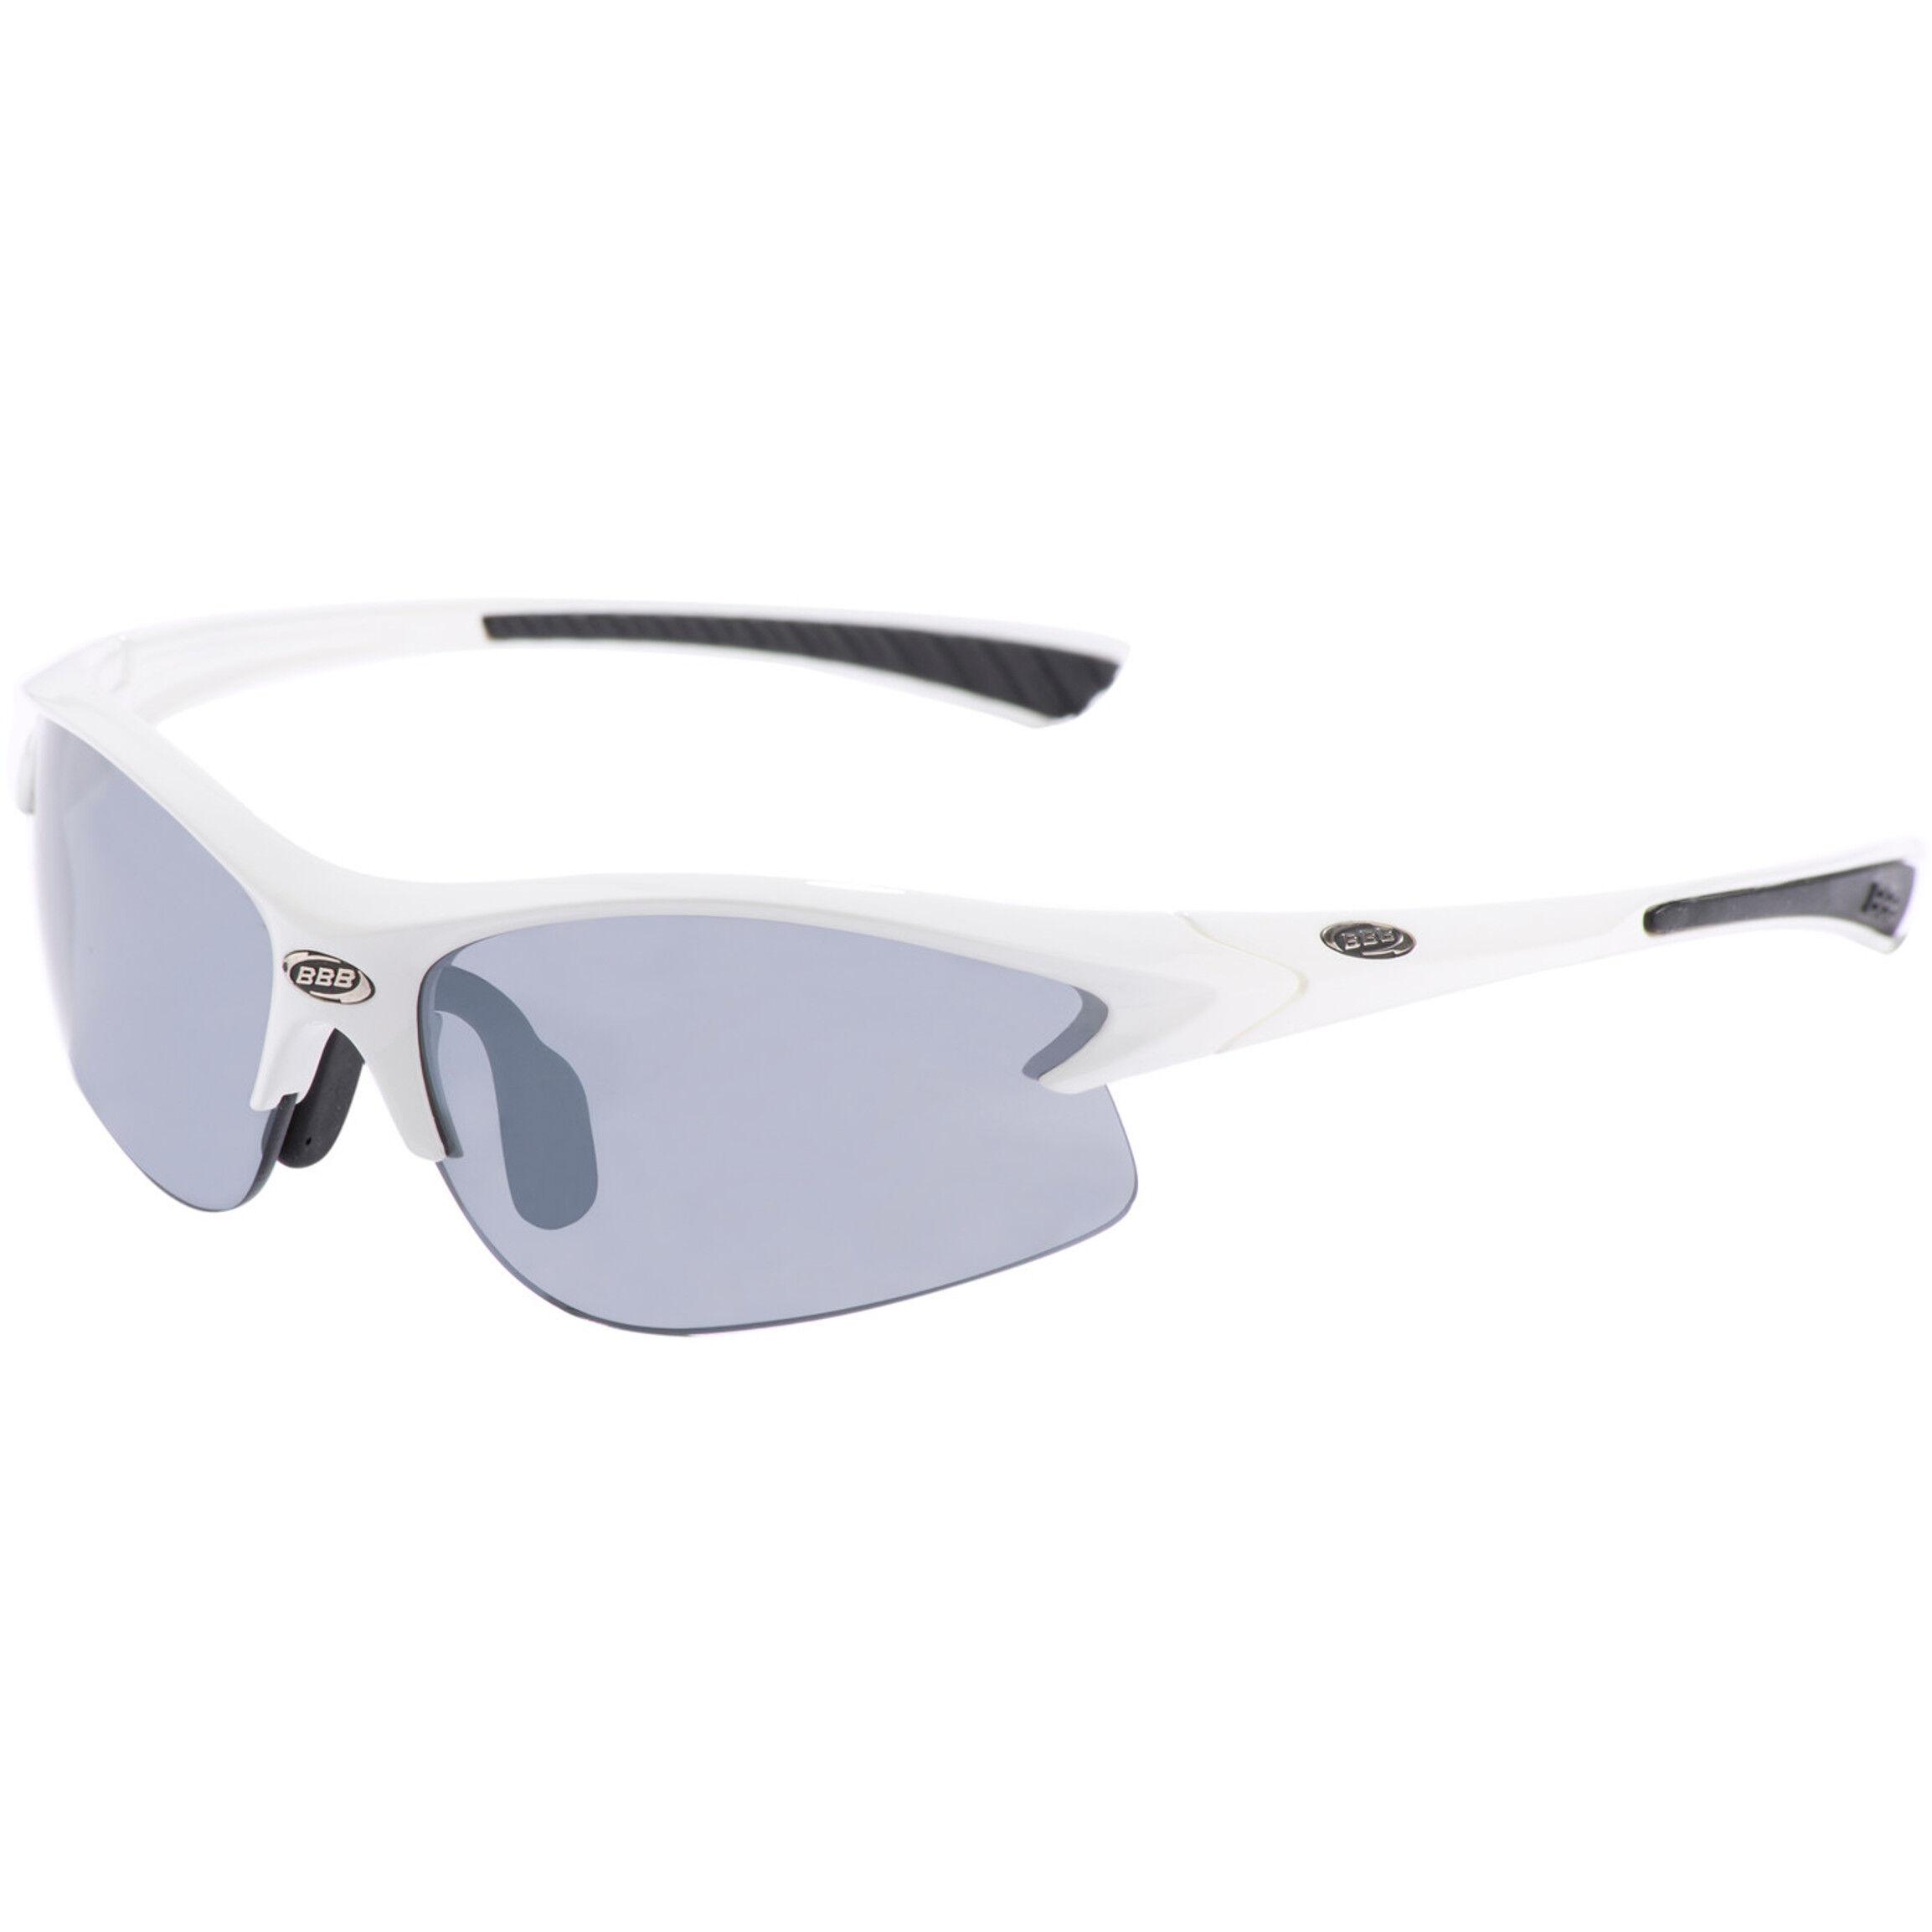 Sonnenbrille 38 Online Bsg Small Bbb Kaufen Impulse roedxWCB